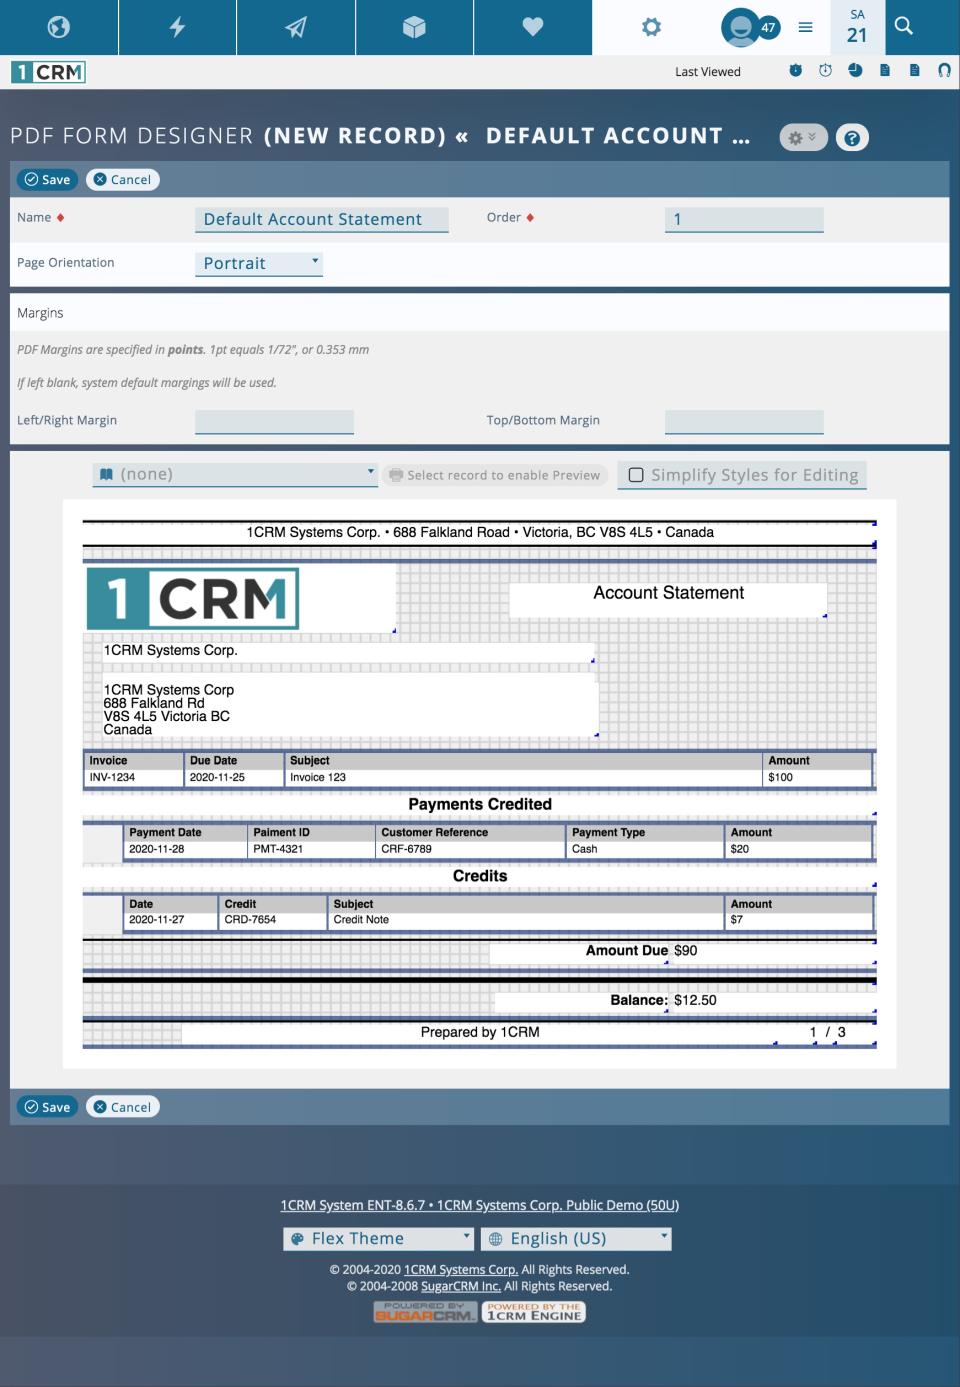 1CRM Logiciel - 5